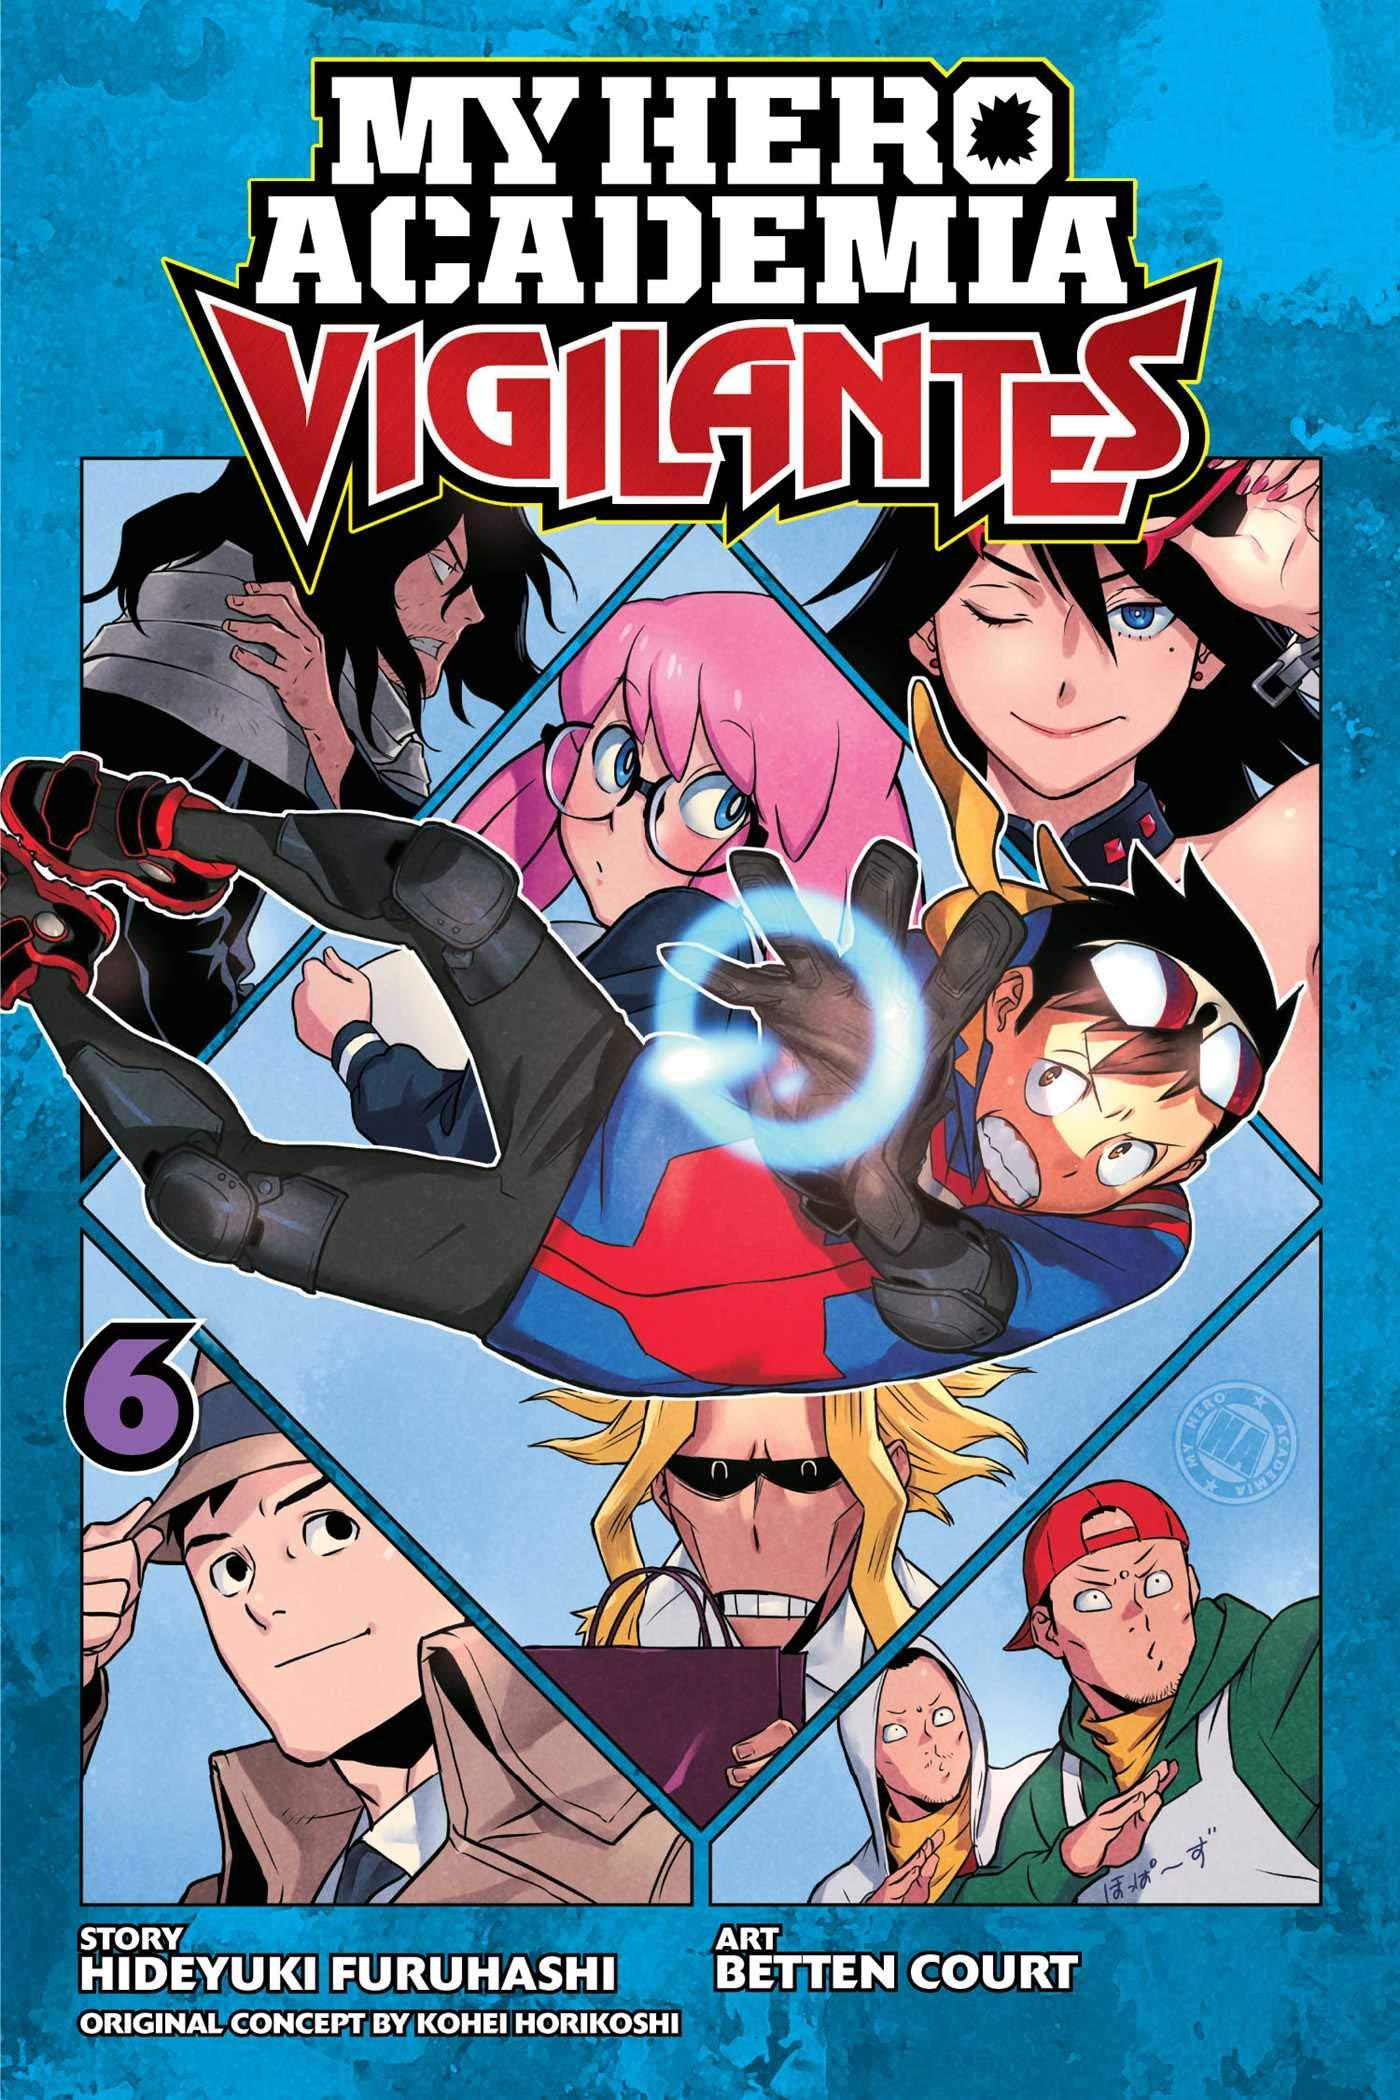 My Hero Academia Vigilantes Vol 6 6 Hideyuki Furuhashi